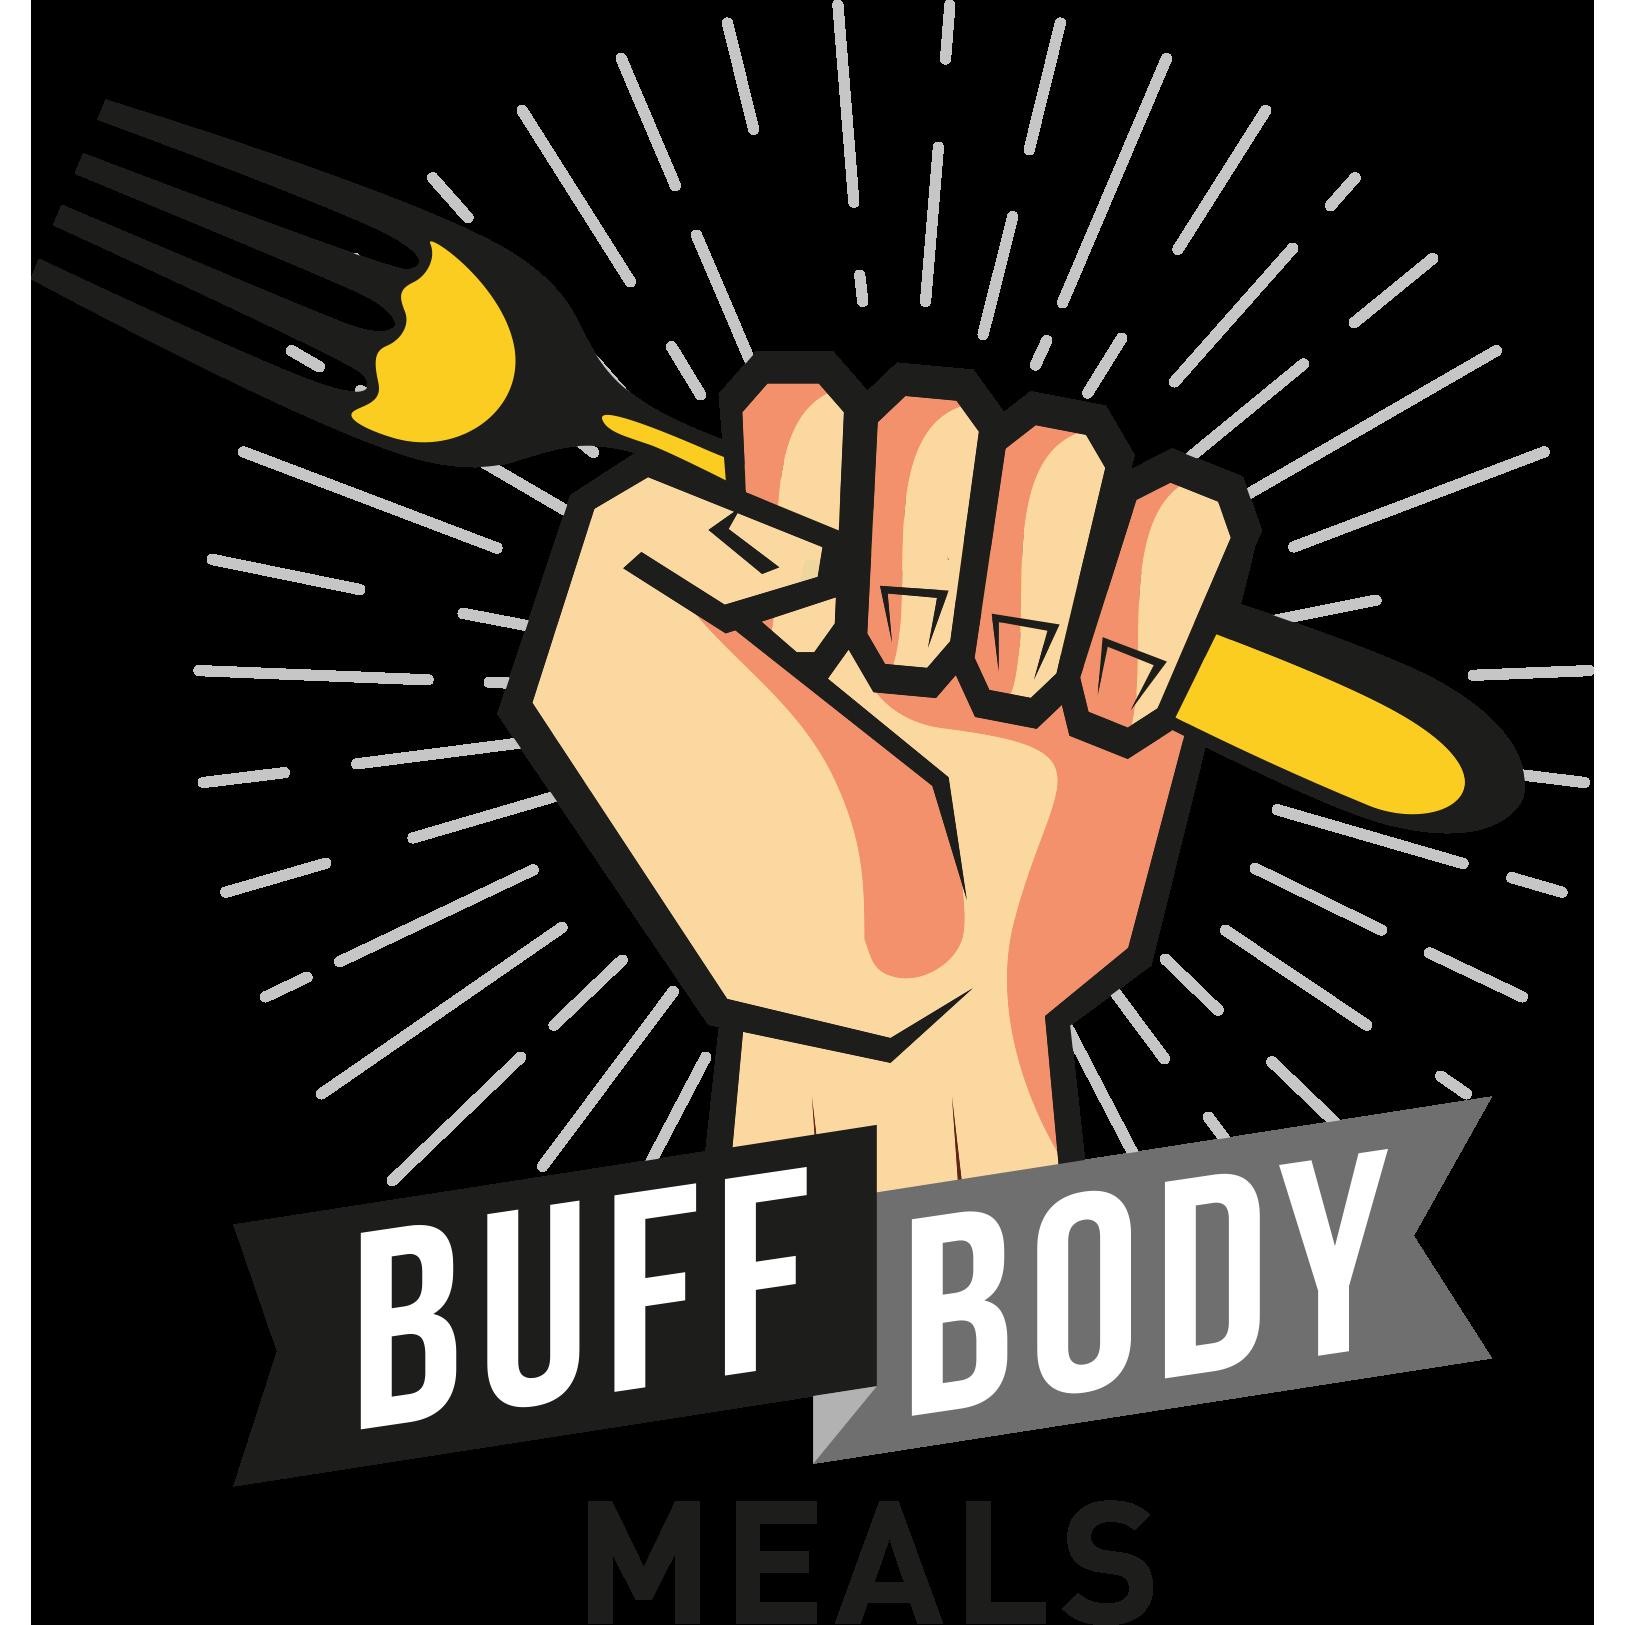 DELICIOUS FOOD, FRESHLY PREPARED, DELIVERED TO YOUR DOOR -